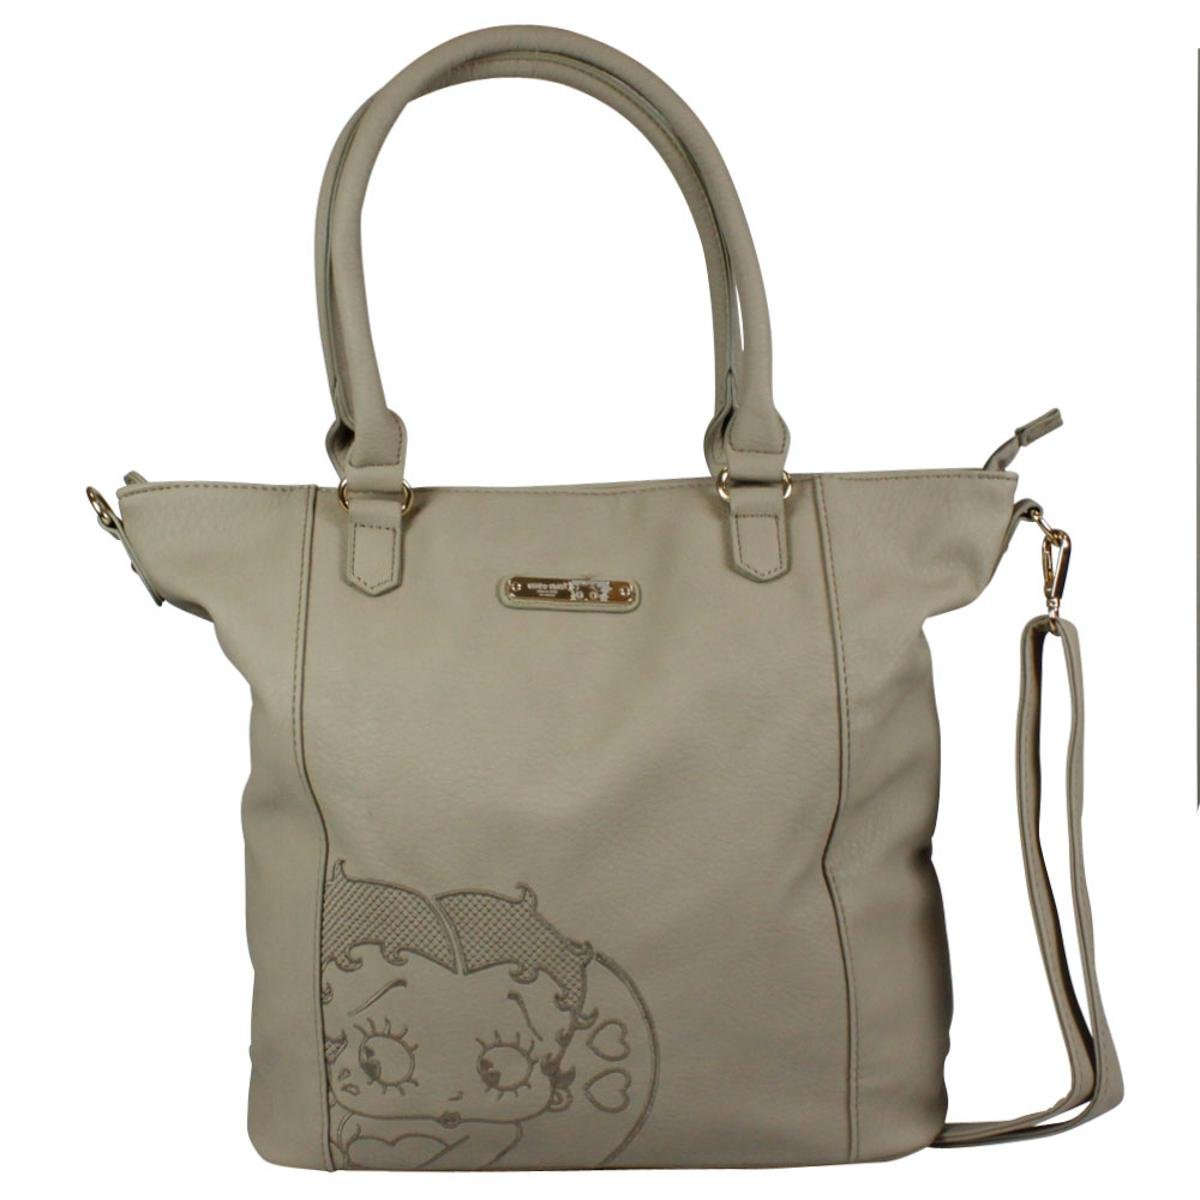 95042f9d7 Bolsa Betty Boop - Compre Agora | Netshoes